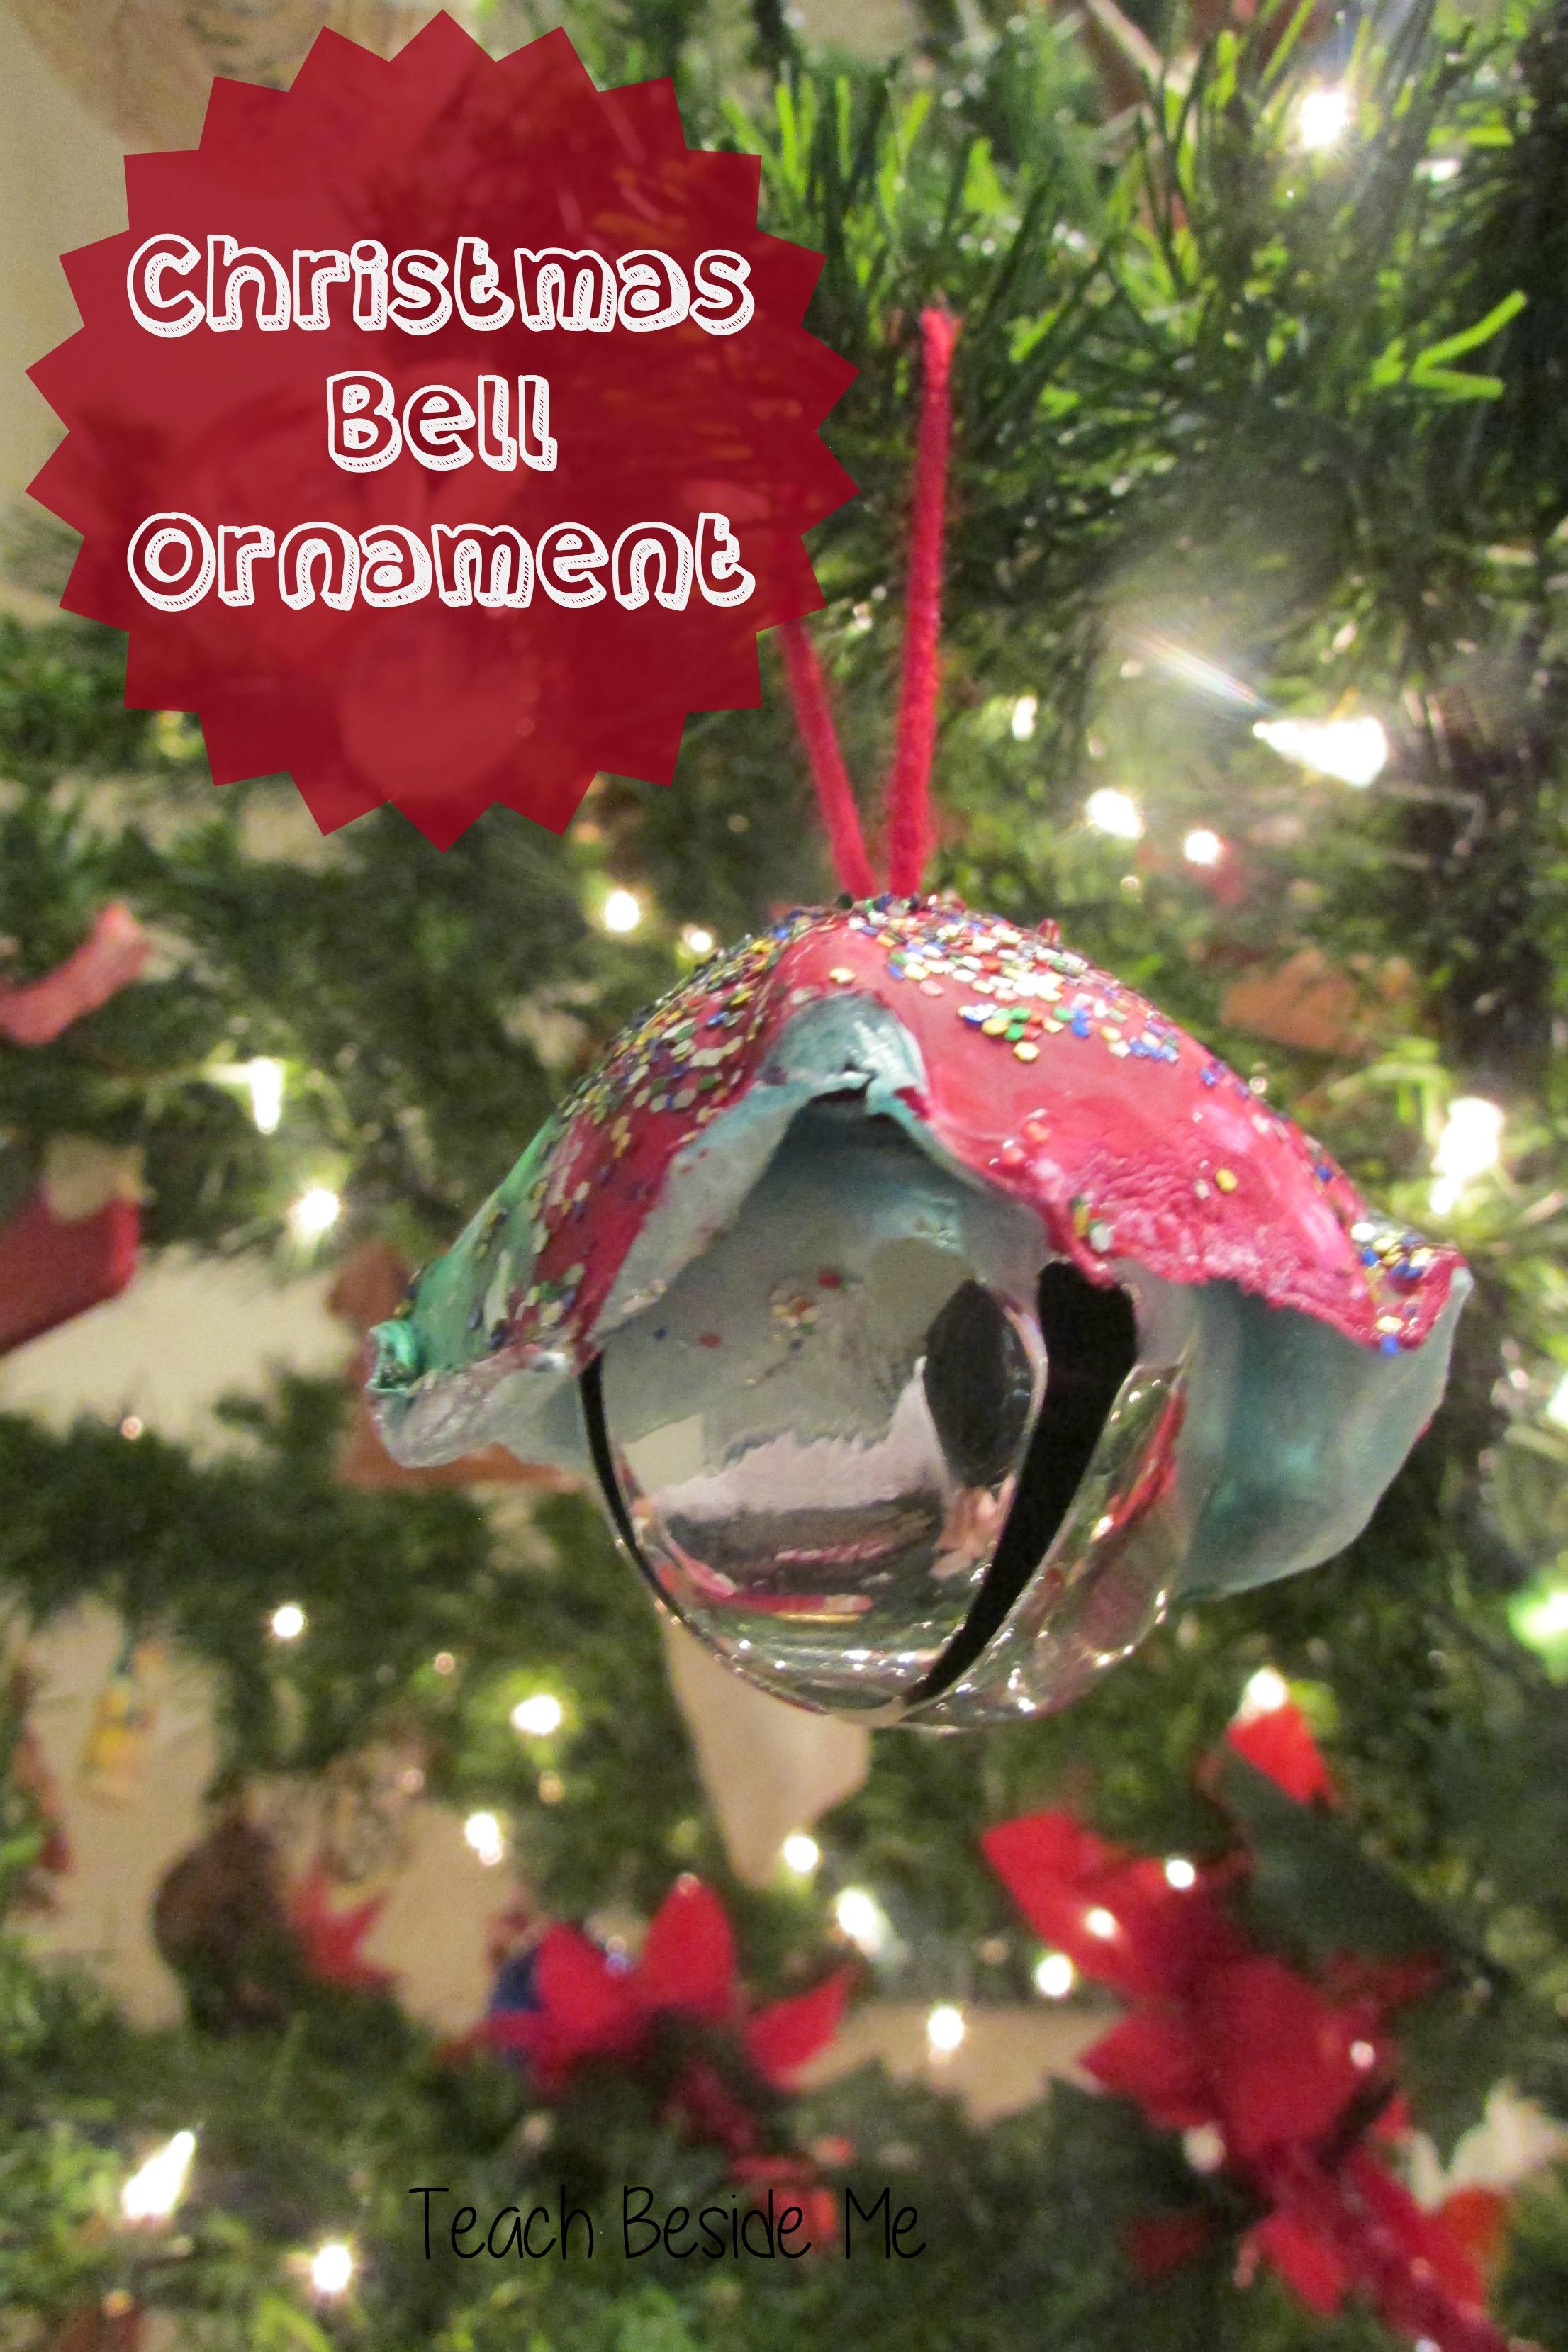 Christmas bell ornaments teach beside me